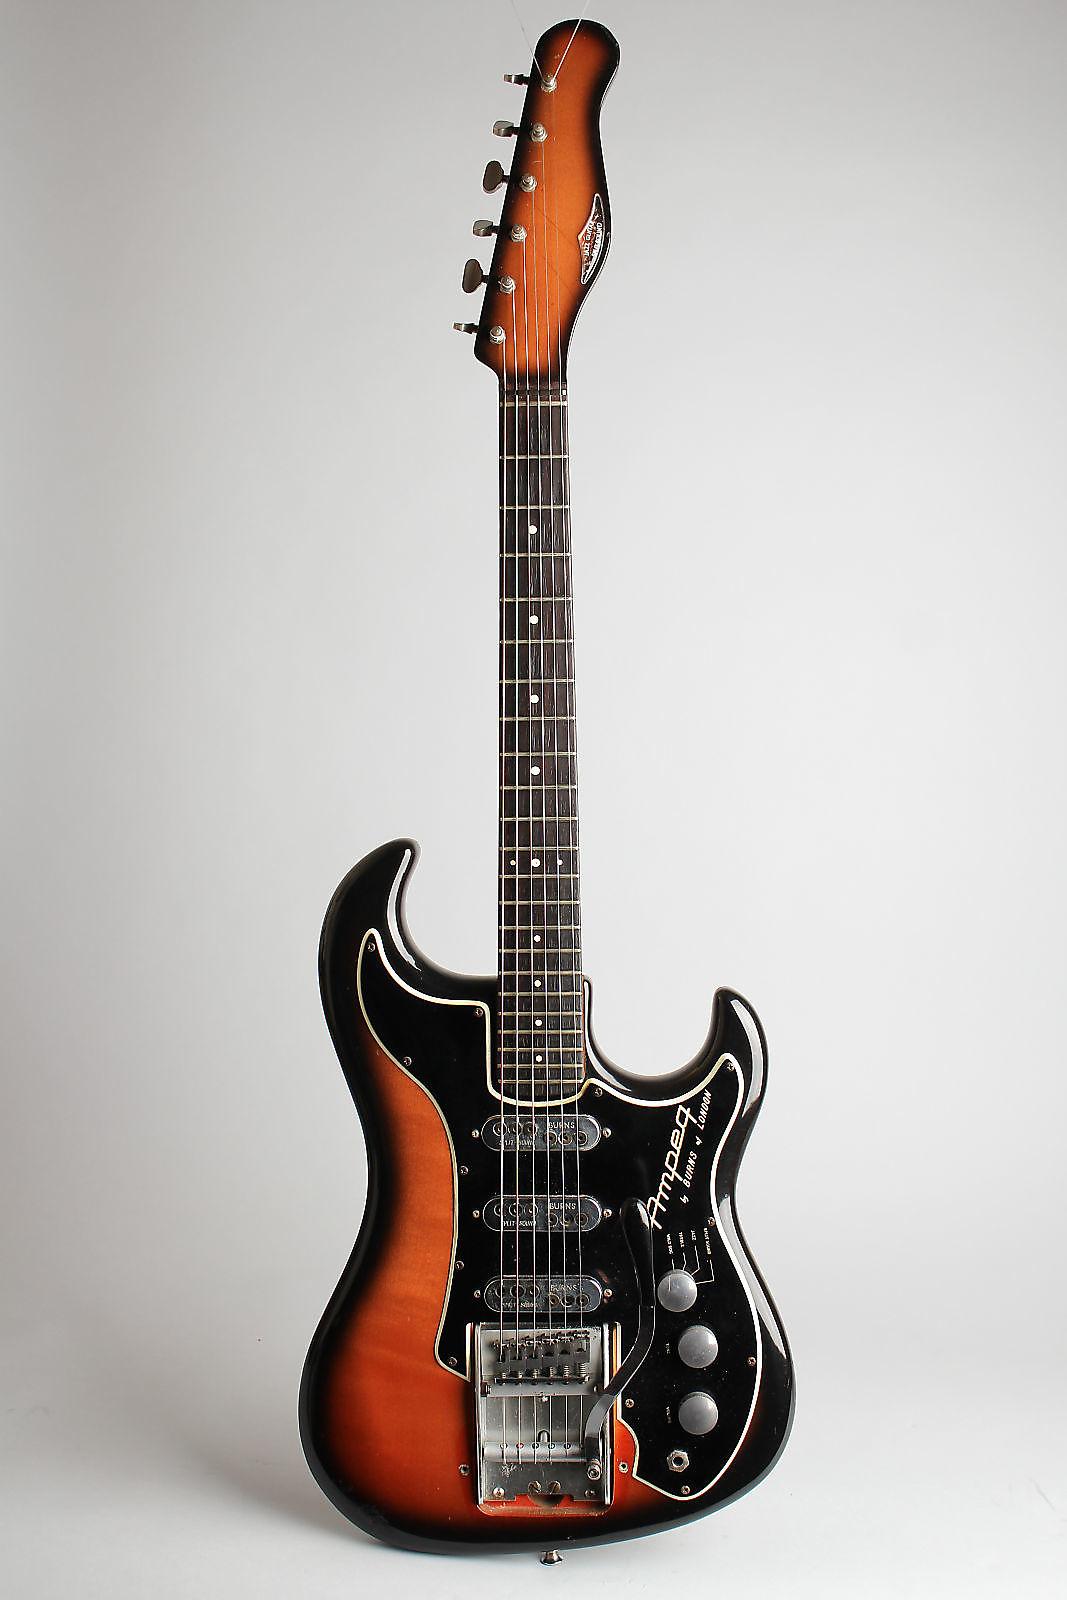 Ampeg Wild Dog EG-1S Jazz Split Sound Solid Body Electric Guitar,  made by Burns (1964), ser. #5031, original blue check tolex hard shell case.